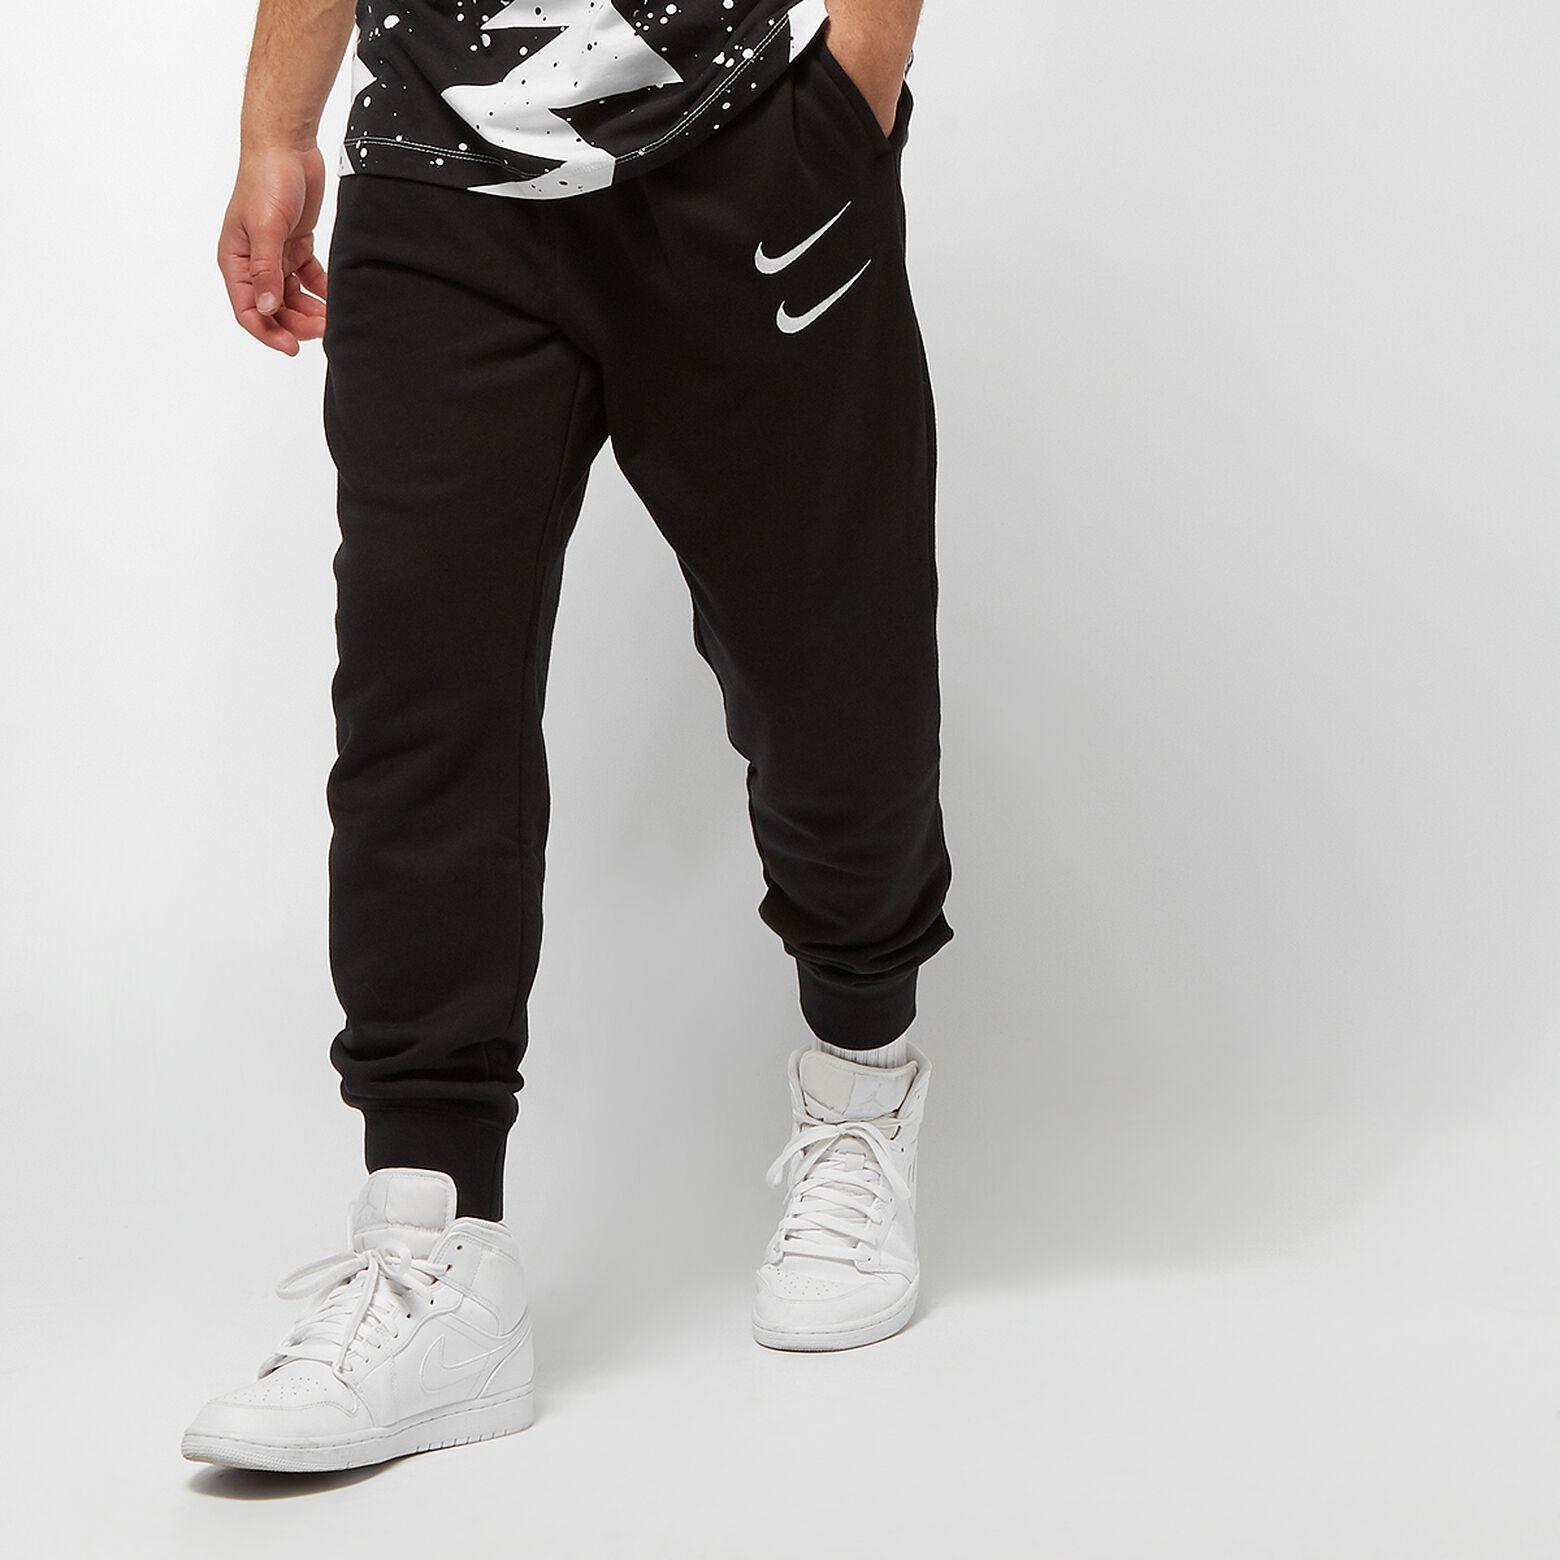 Herren Nike Sweatpants Swoosh schwarz in Größen S,M,L,XL